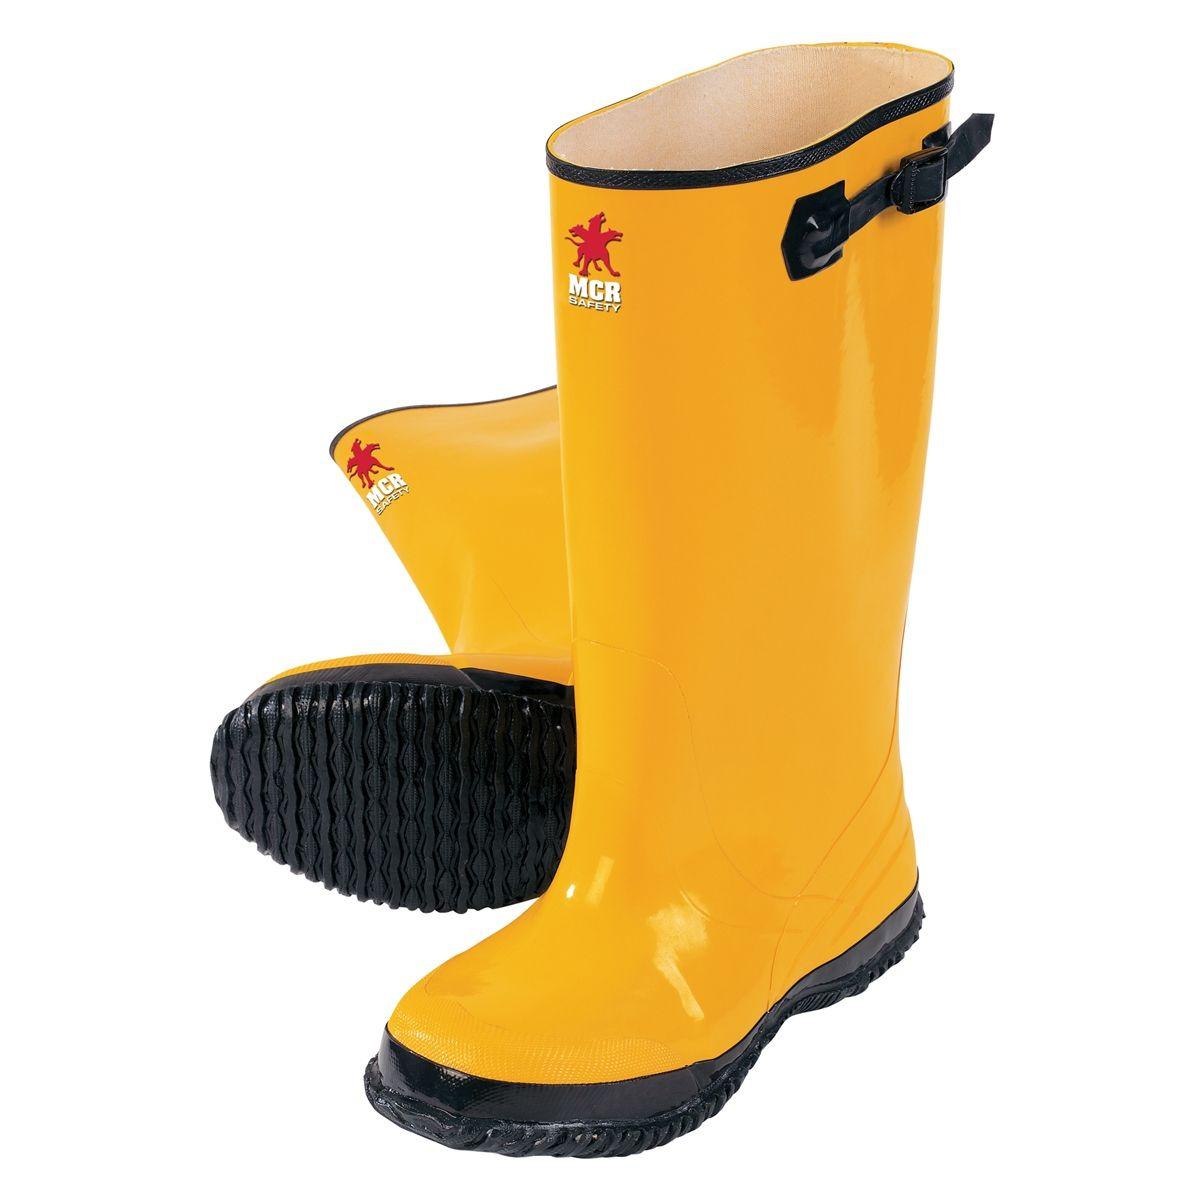 b27ab96acff River City BYR100 Rubber Slush Boots - Yellow   Workwear   Boots ...